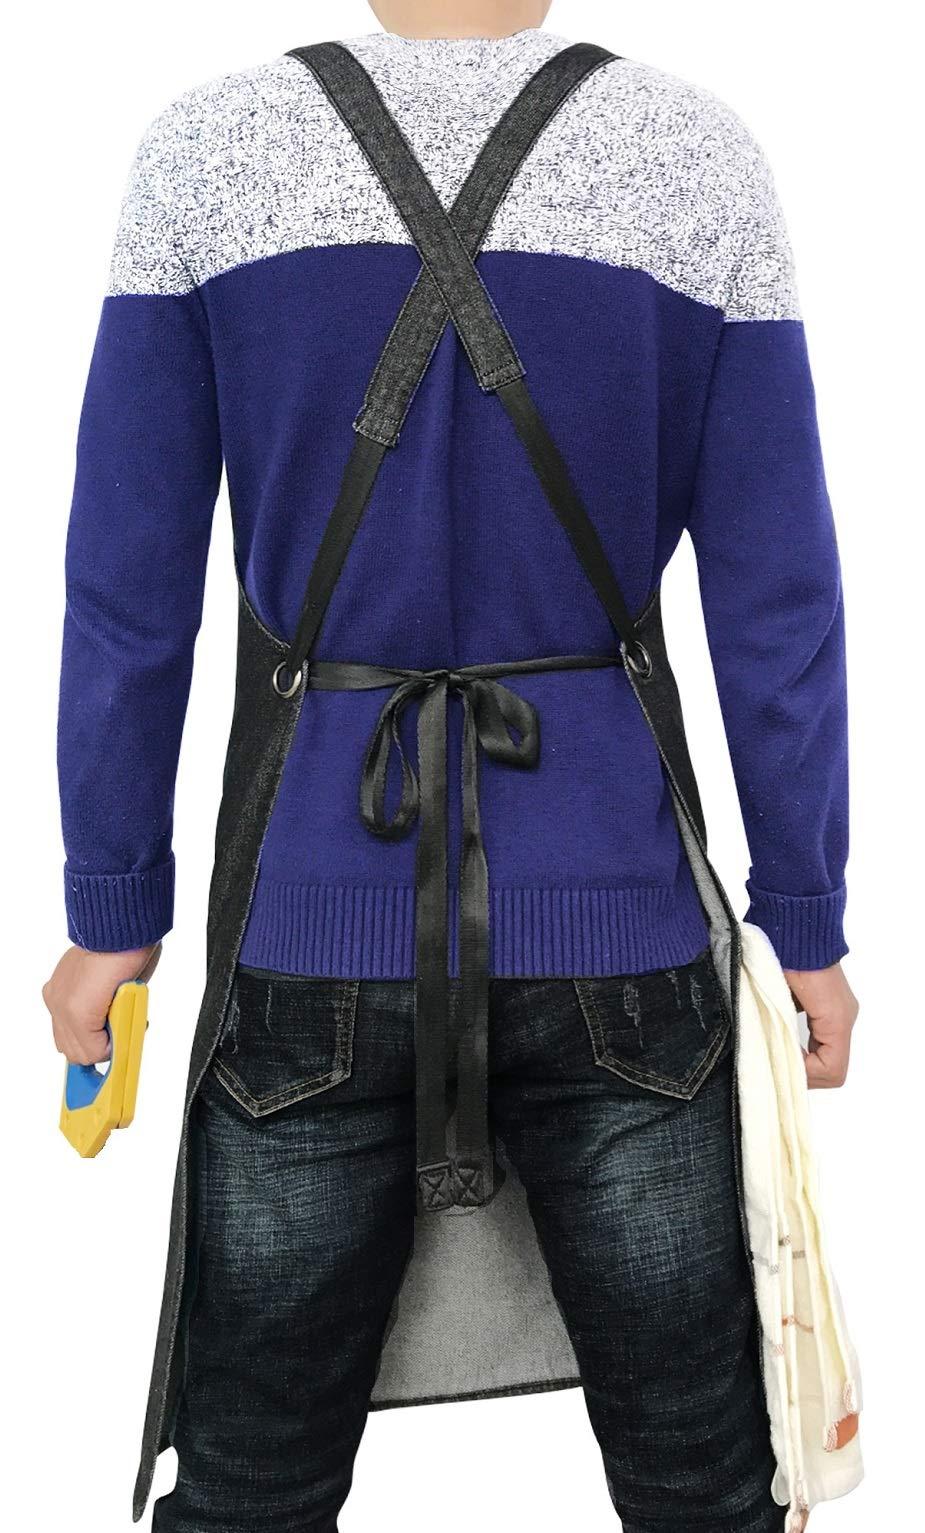 Heavy Duty Denim Jean Shop Work Apron Woodworking Aprons - 10 Tool Pockets | Towel Loop | Cross-back, Adjustable Unisex Utility Bib Apron Fits Men Women, M-XXL by Duo Bao Yu (Image #2)